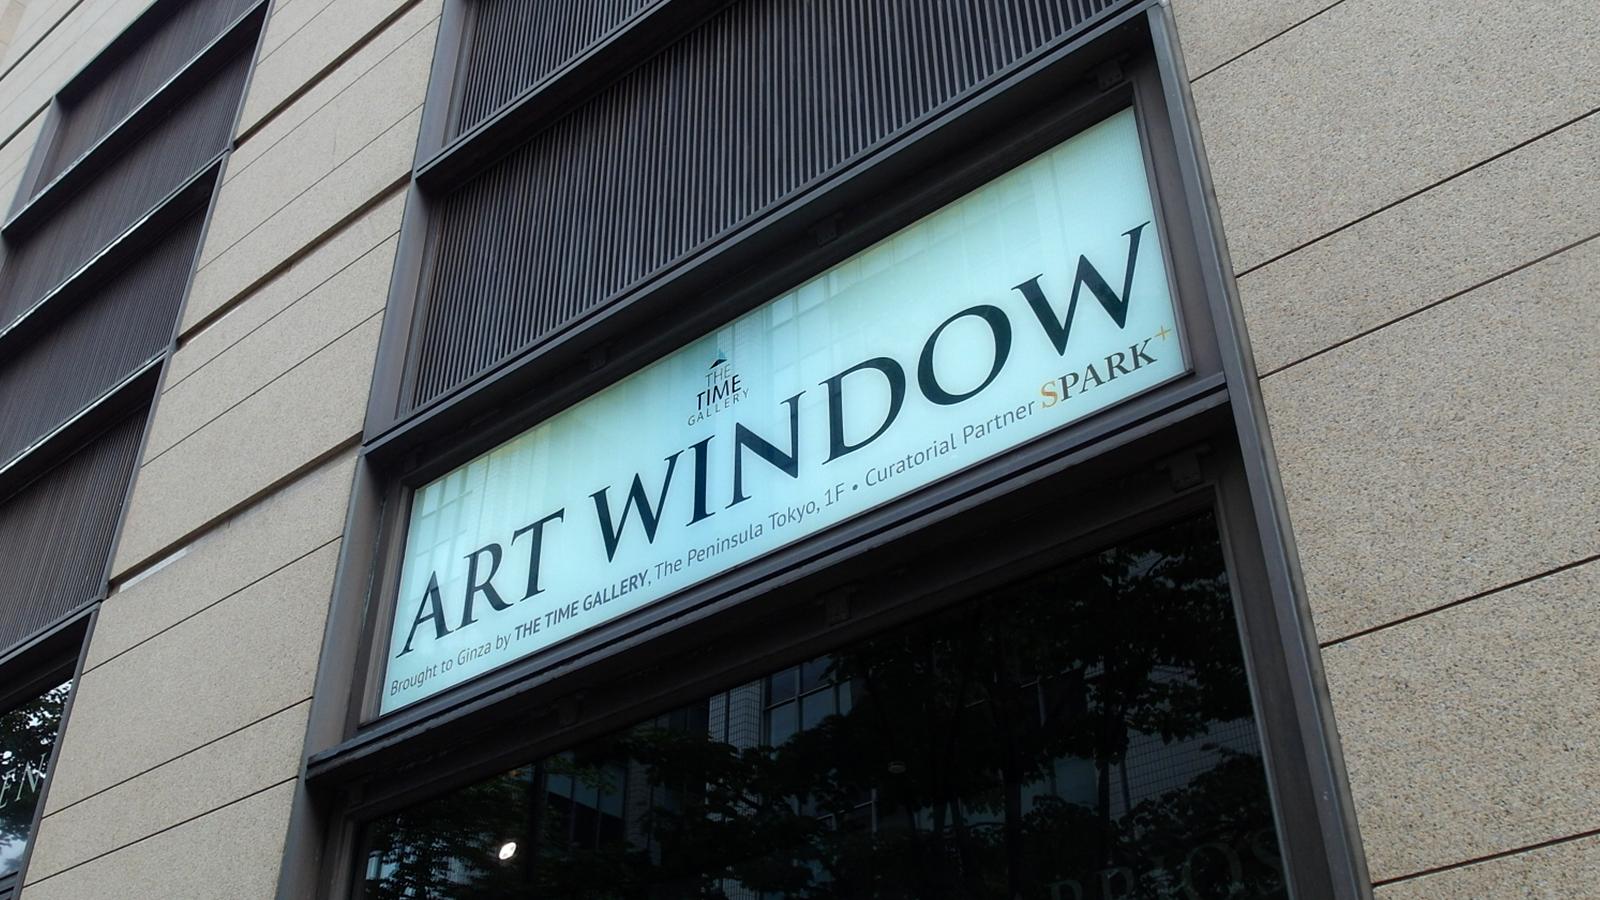 Rafael Barrios Art Window 5